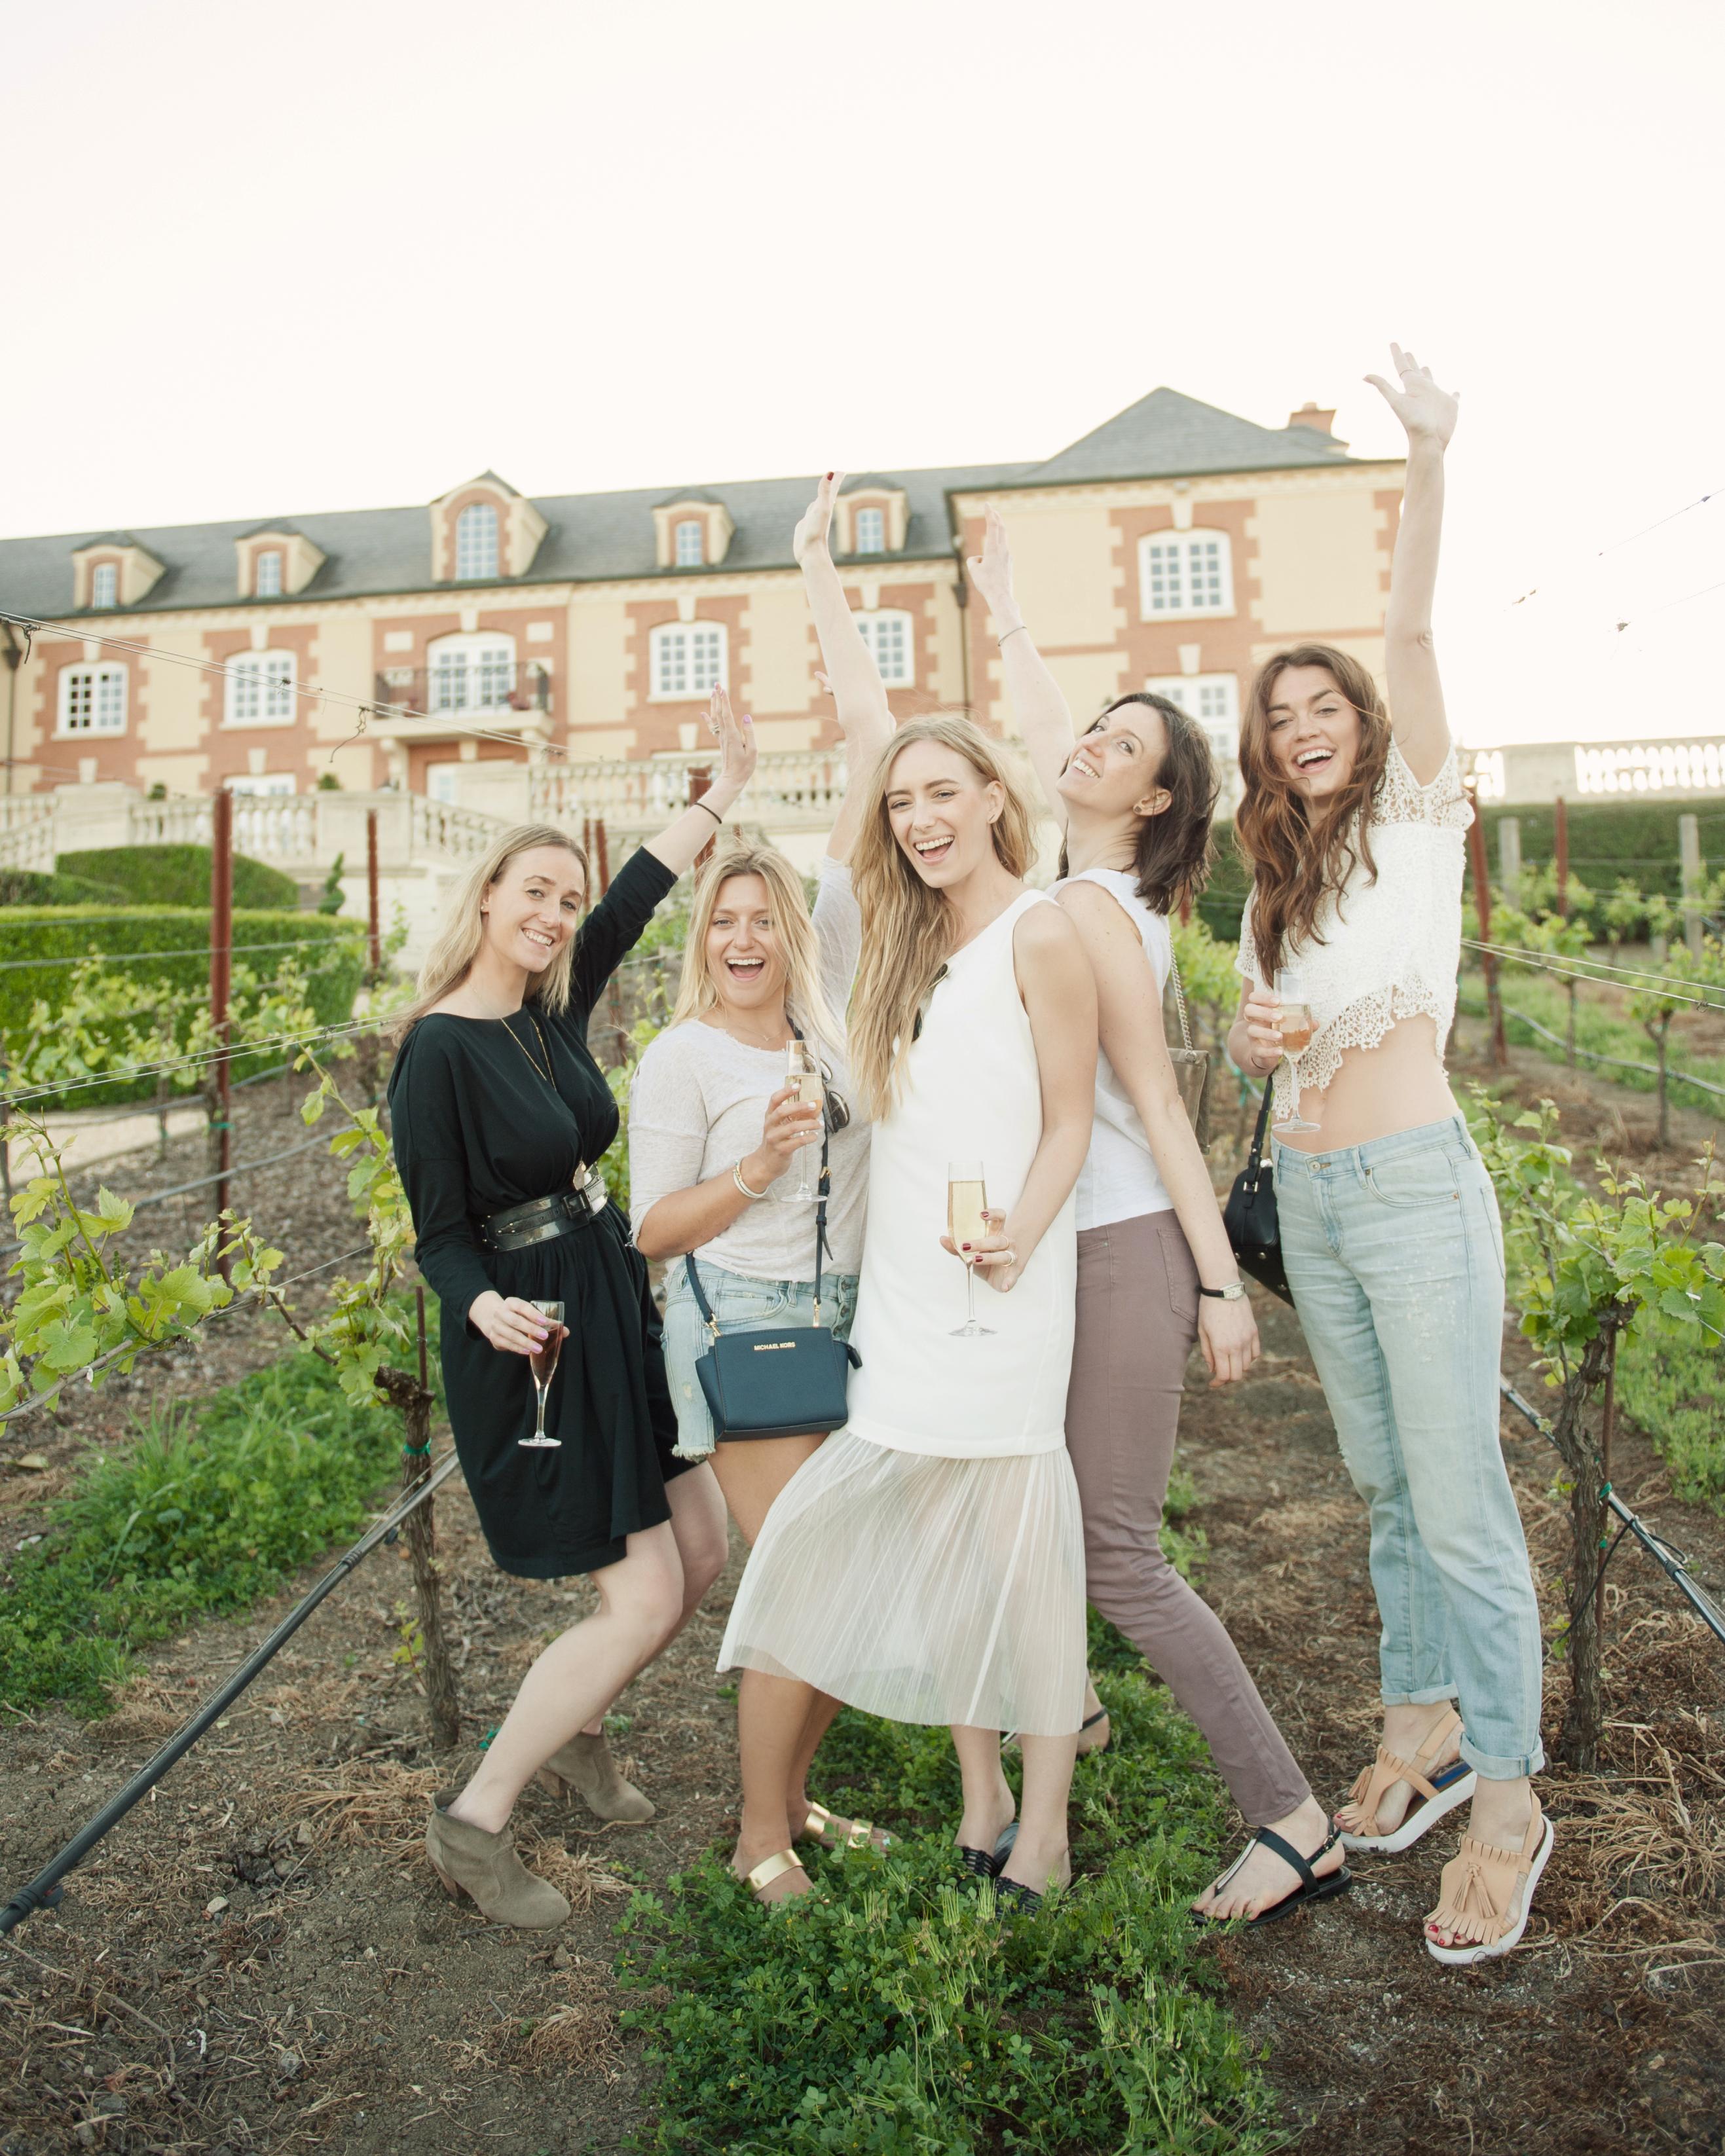 eatsleepwear-napa-valley-bachelorette-party-friends-vineyard-arms-0415.jpg